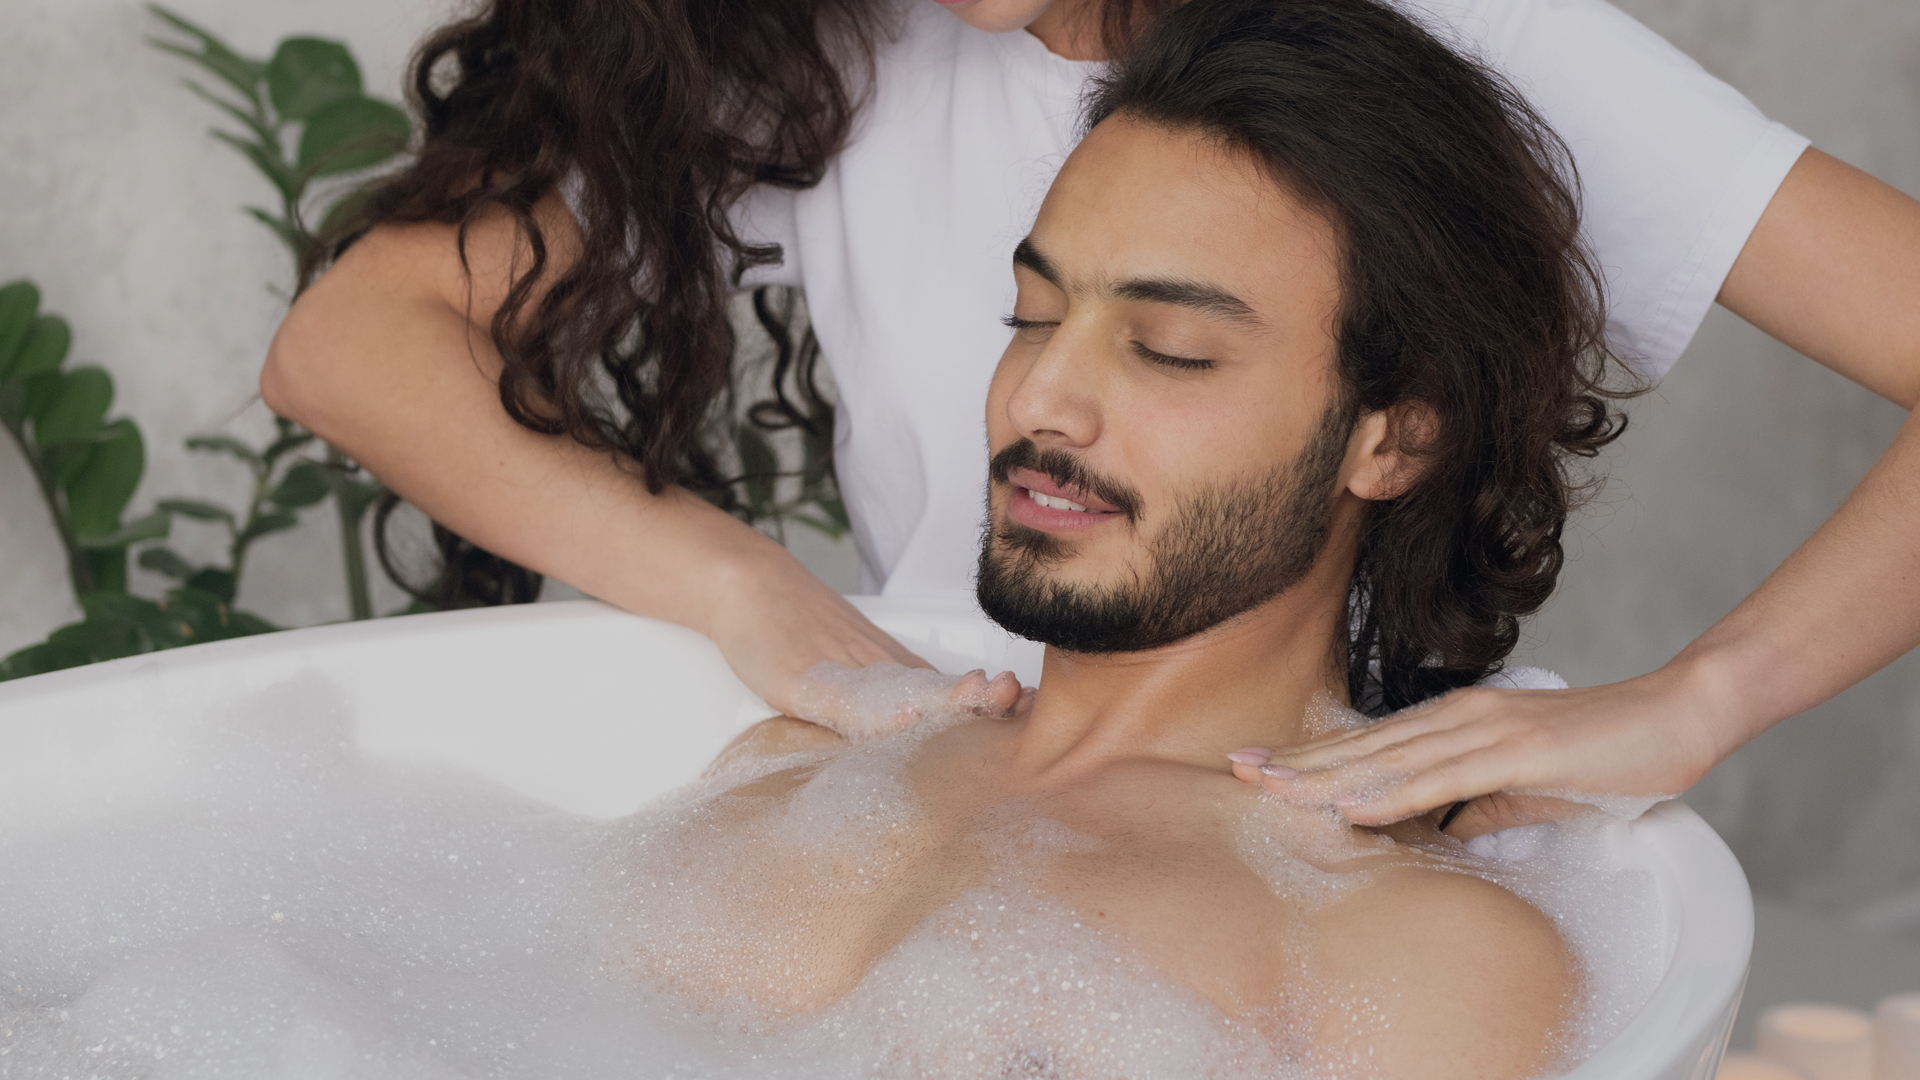 Pretty young woman making massage to her husband enjoying hot bath with foam